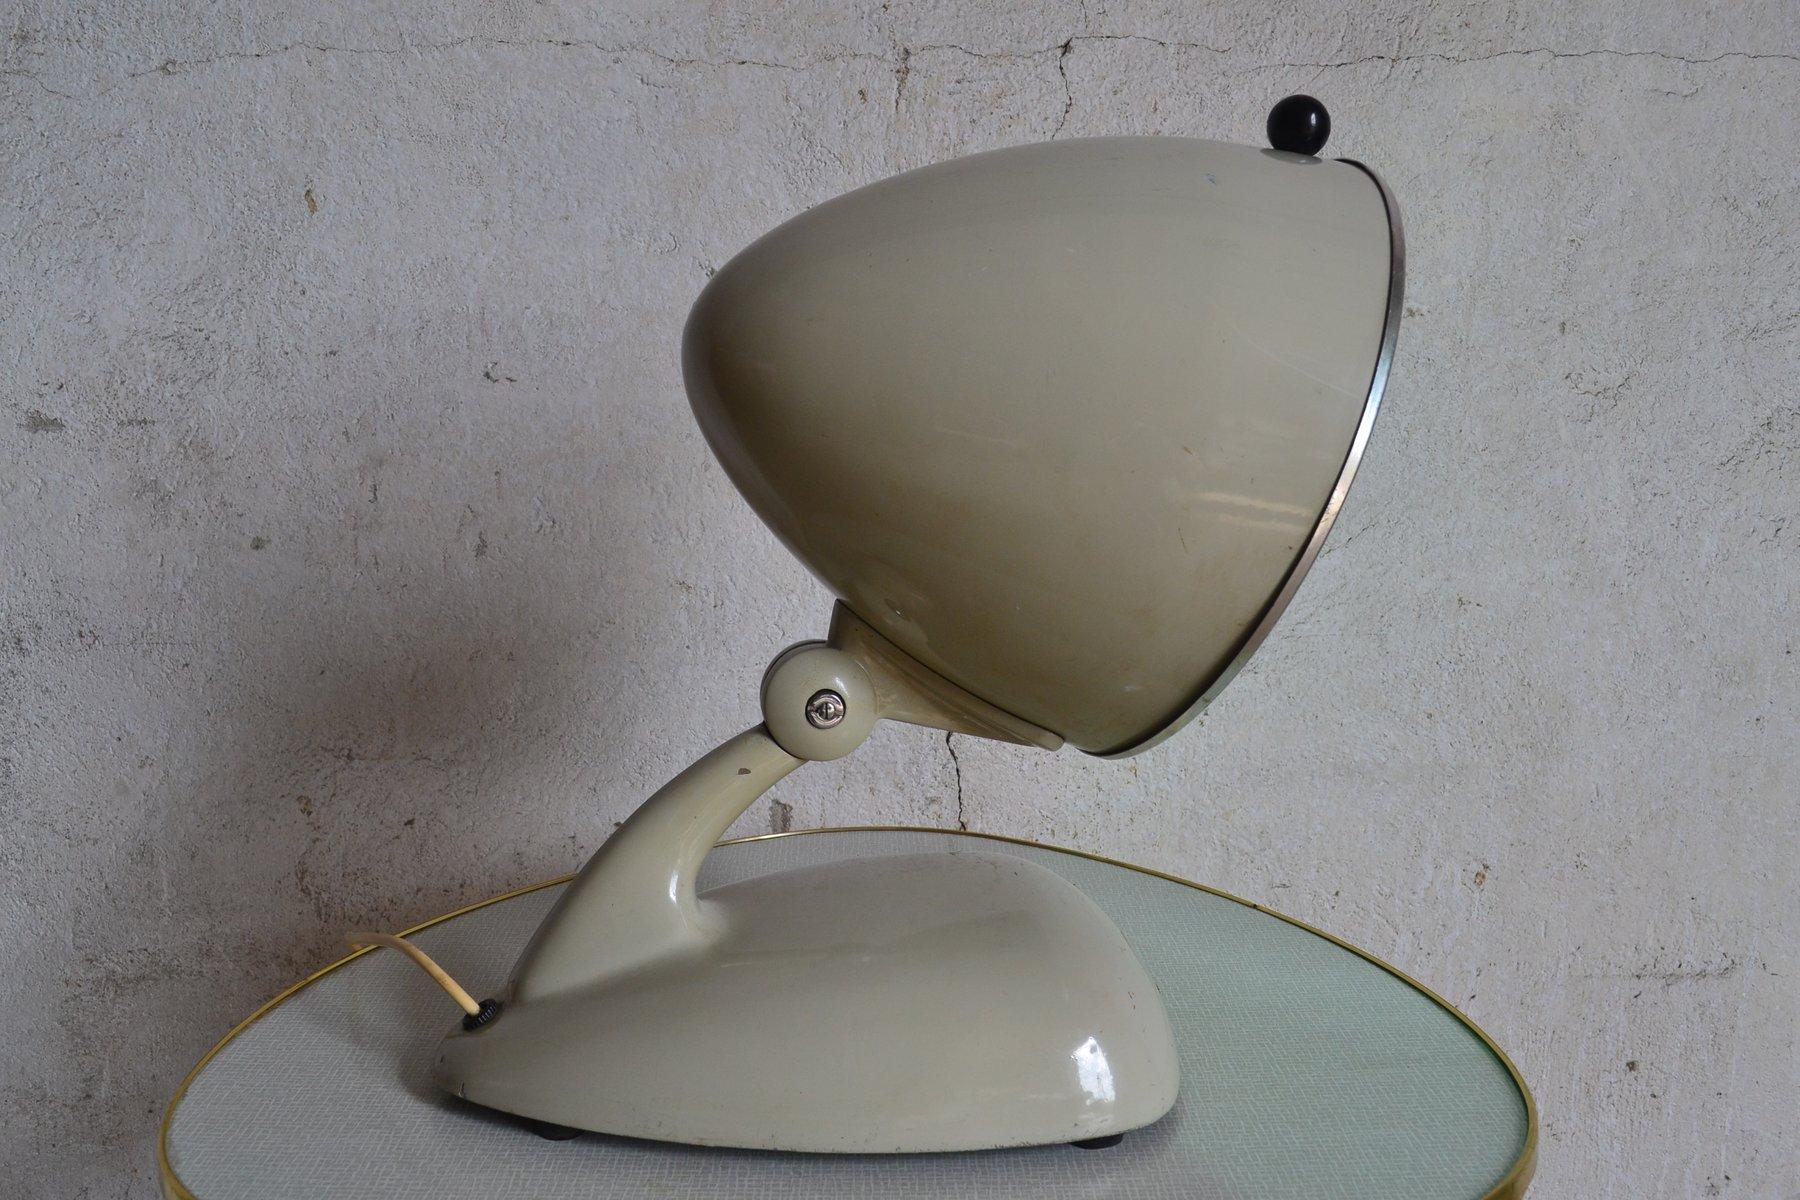 Arztlampe von Famed, 1960er